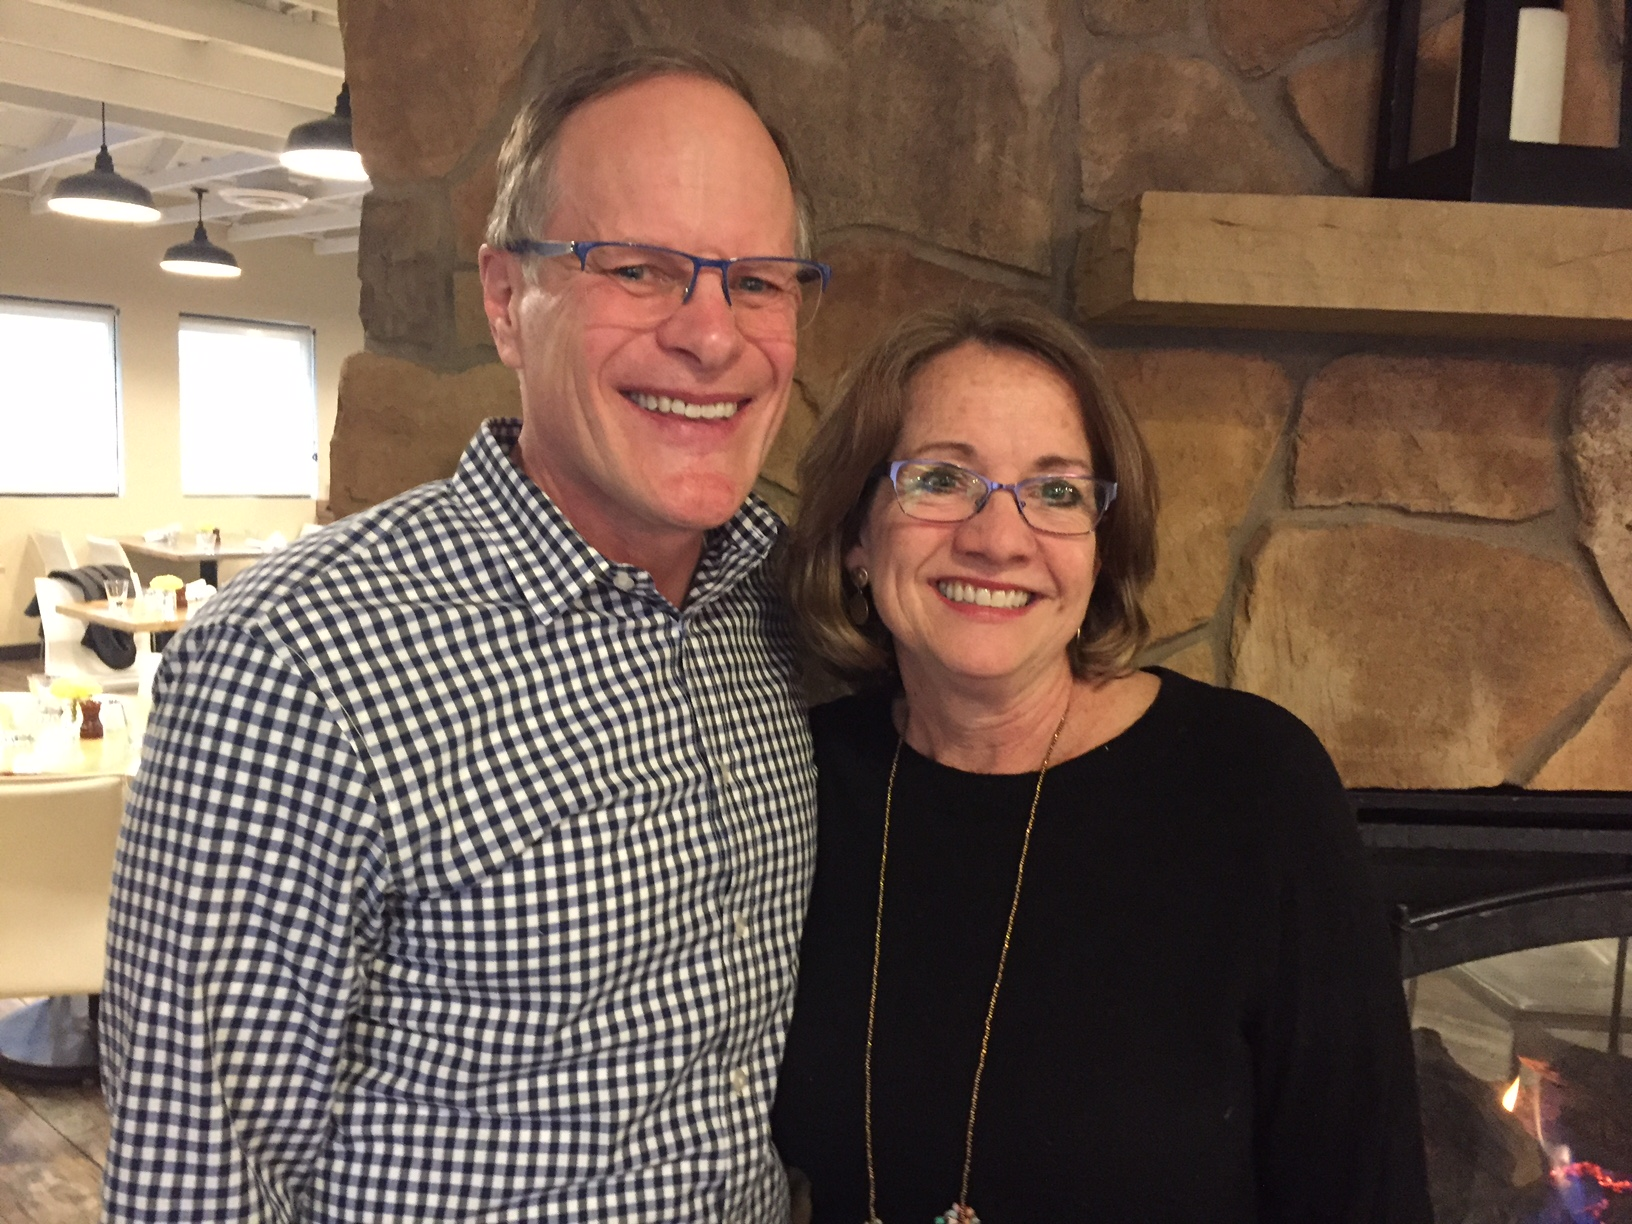 Doug and Pam Nuenke, Navs